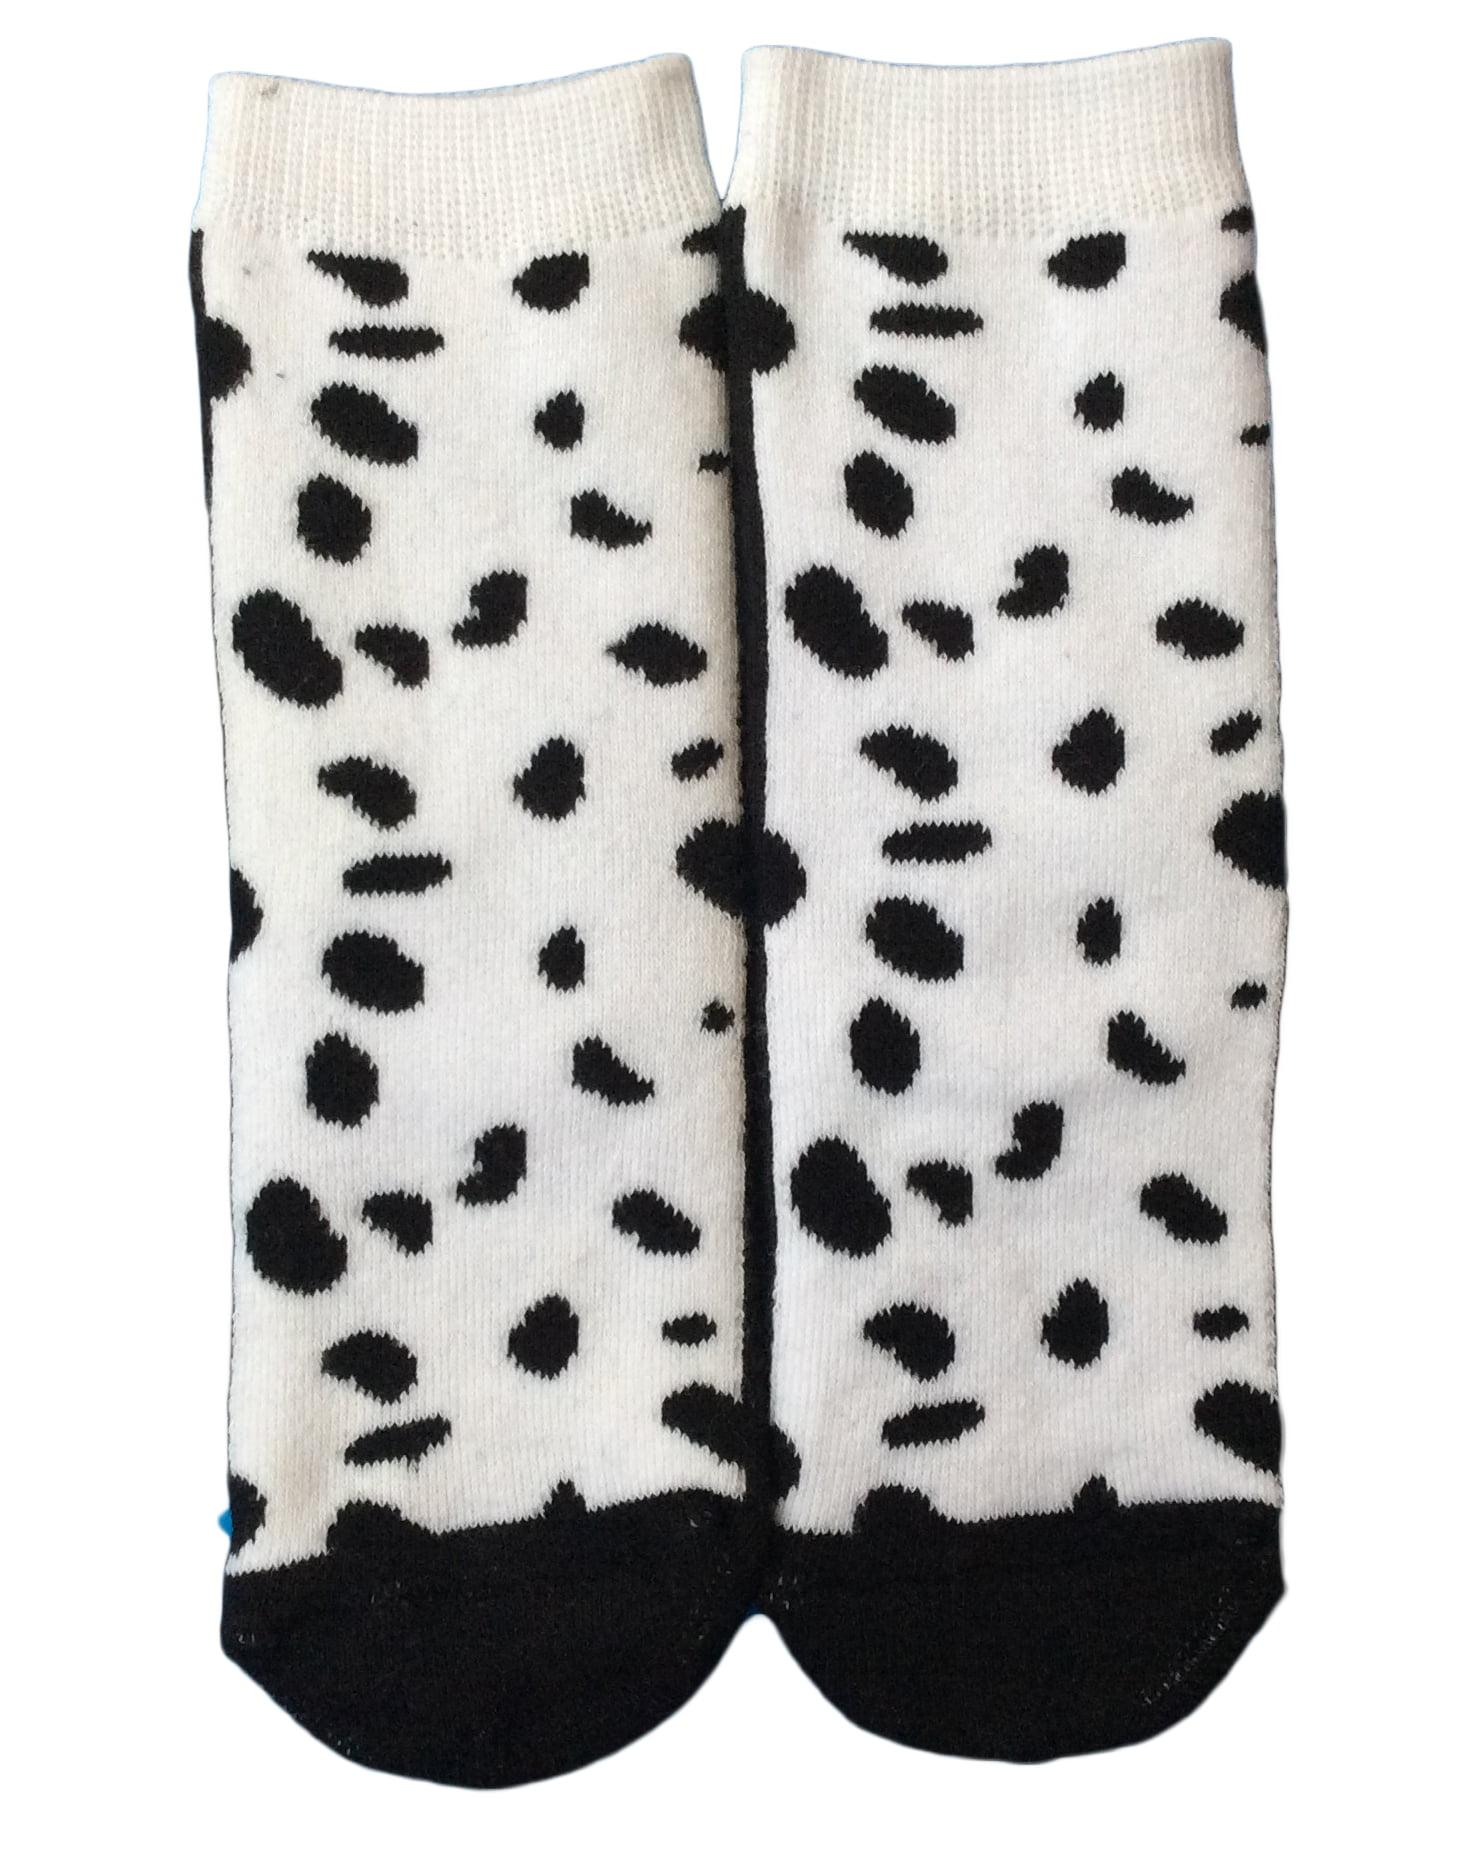 LovelyAnnie Unisex Children 3 Pairs Pack Non Slip Combed Cotton Socks 6M-12M Multi Color